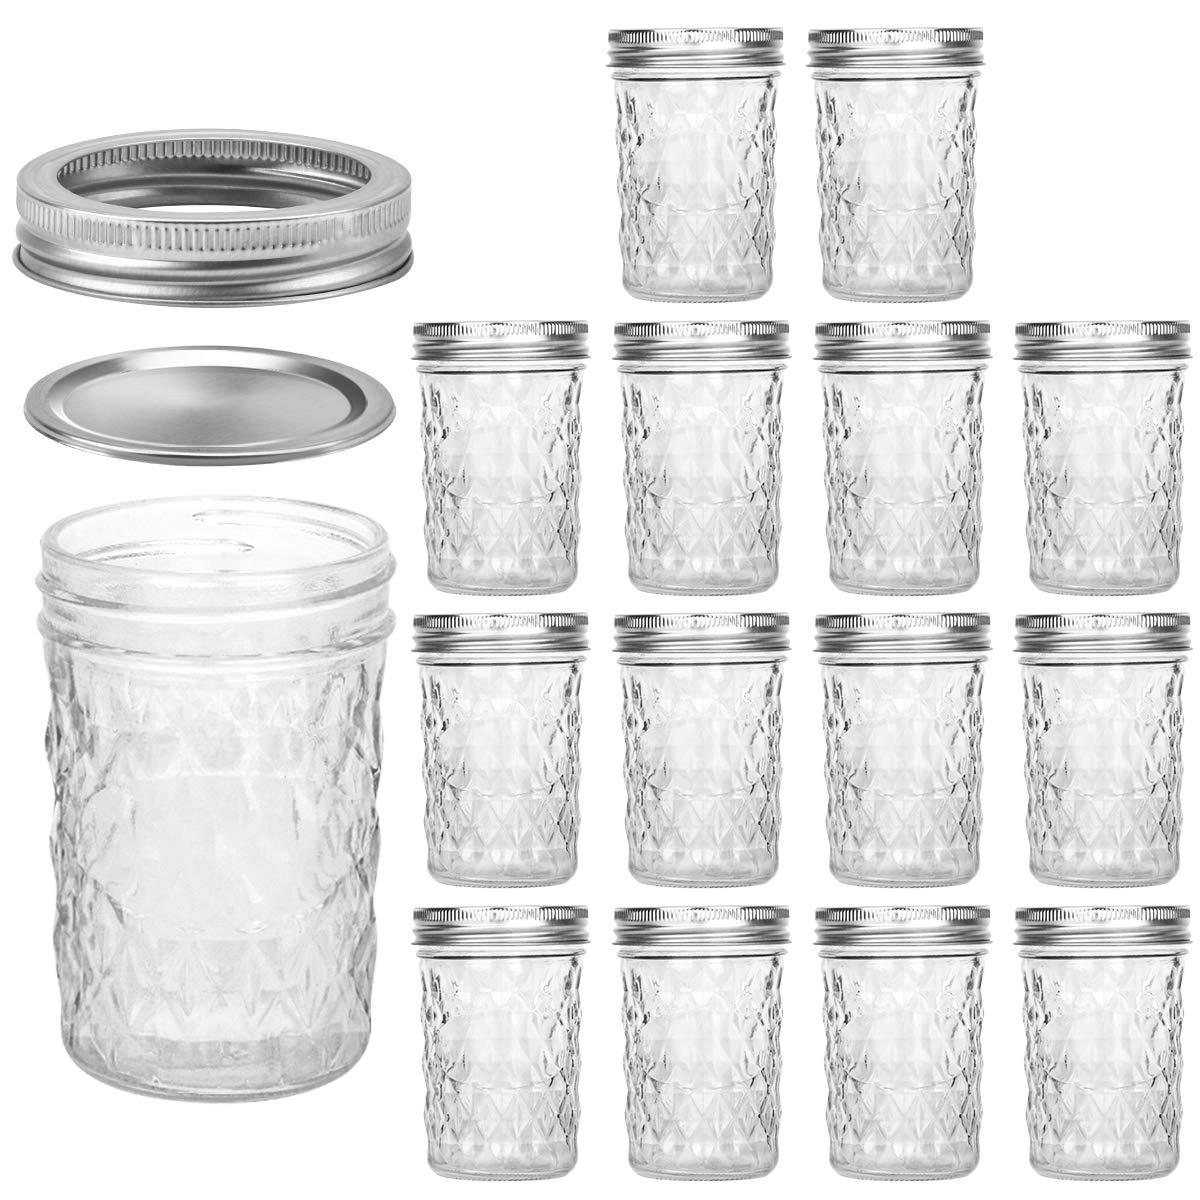 Mason Jars 8 OZ, VERONES 8 OZ Canning Jars Jelly Jars With Regular Lids, Ideal for Jam, Honey, Wedding Favors, Shower Favors, Baby Foods, 15 PACK by VERONES